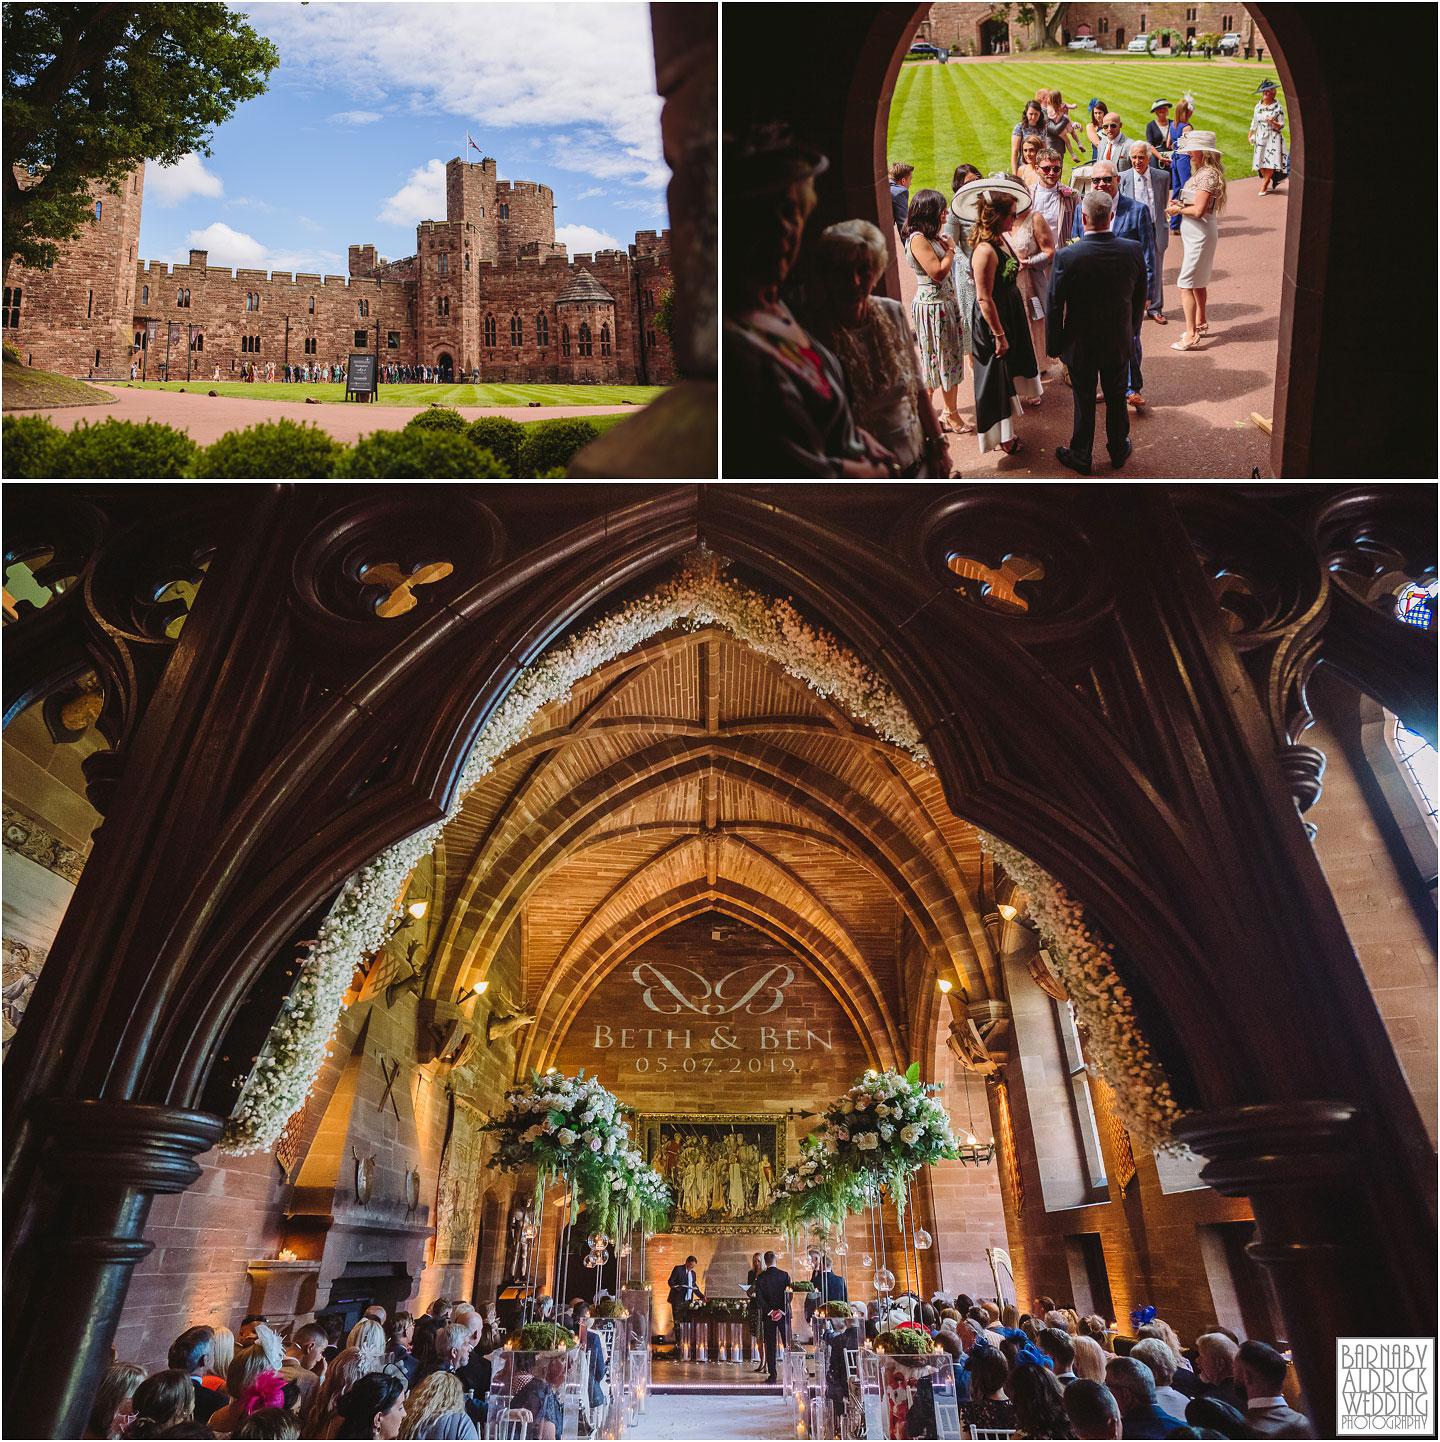 Civil ceremony at Peckforton Castle Wedding Photos, Cheshire Wedding Photography at Peckforton Castle, Peckforton Castle Wedding, UK Castle Wedding